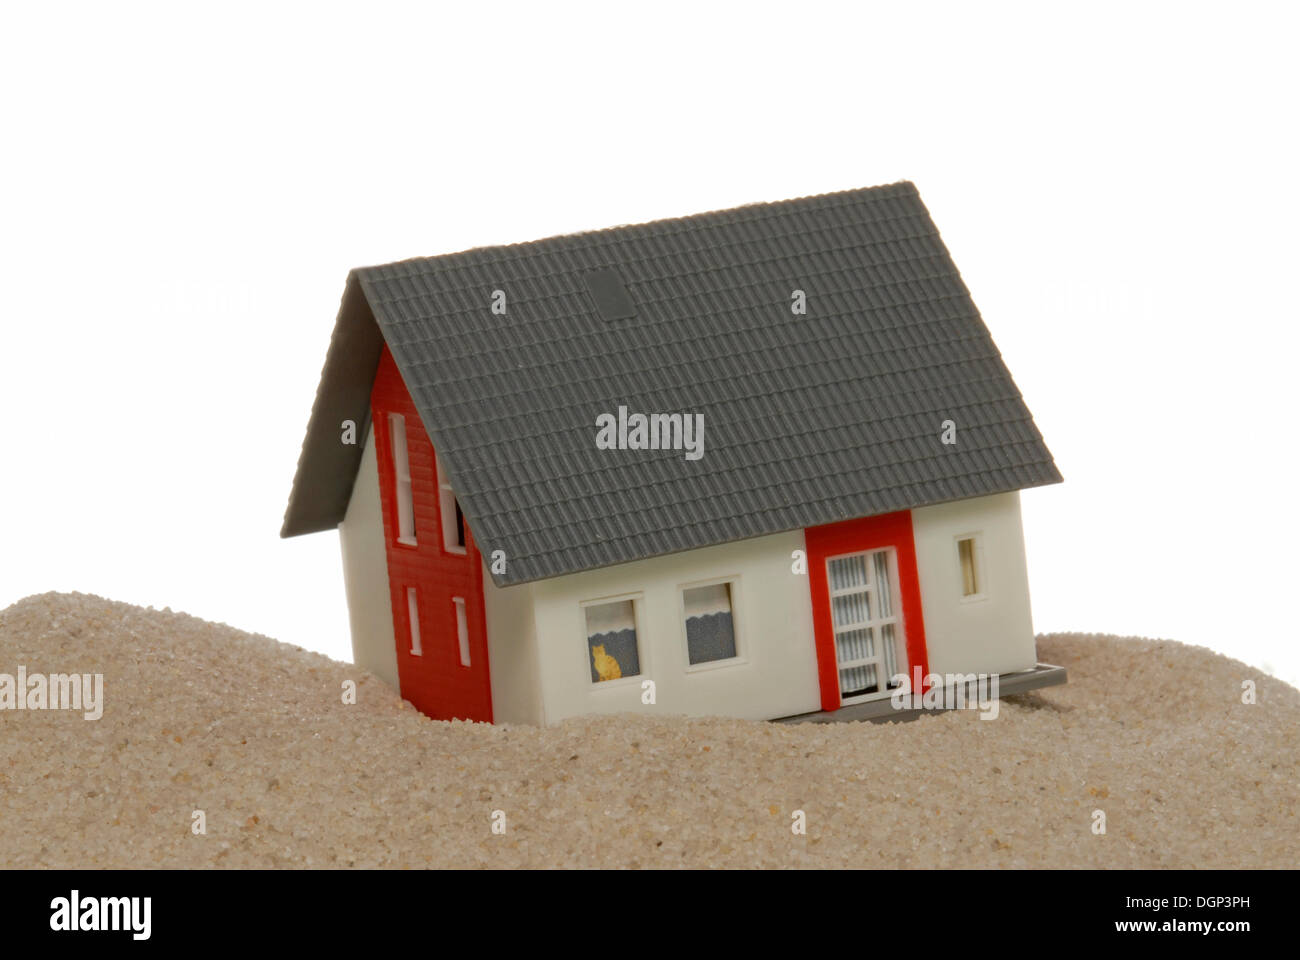 Miniature house built on sand - Stock Image